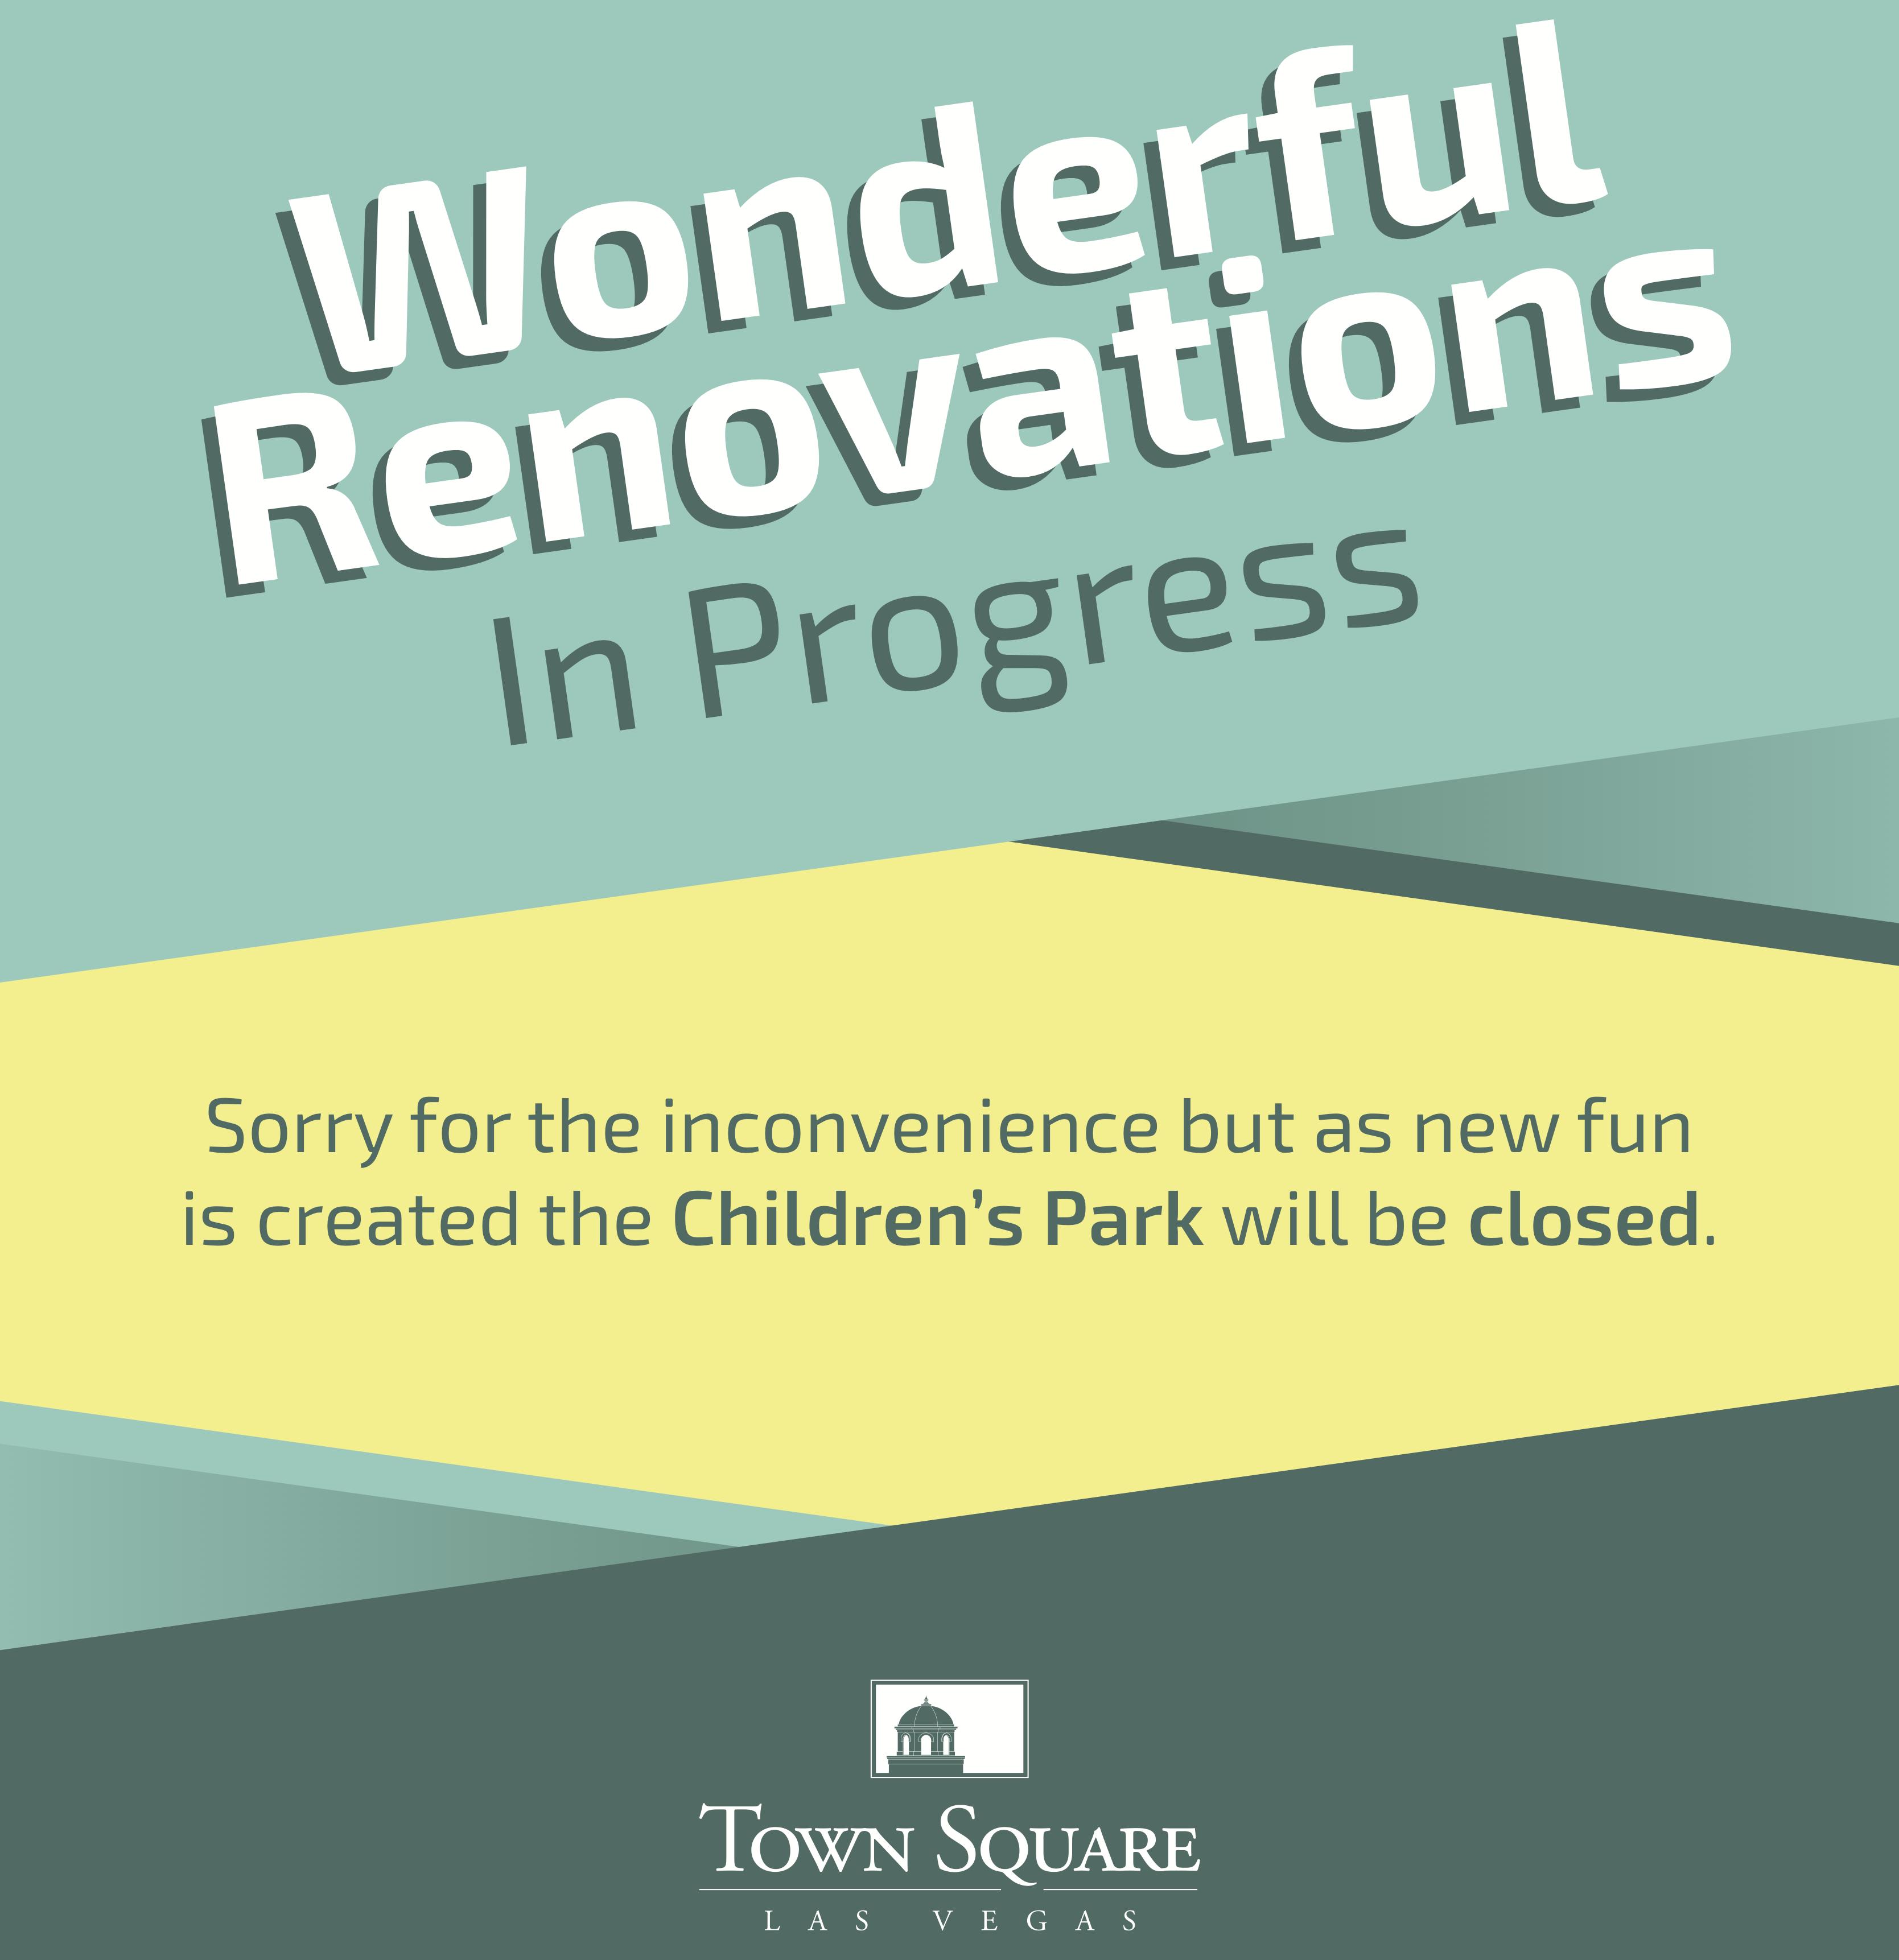 Childrens Park Renovations